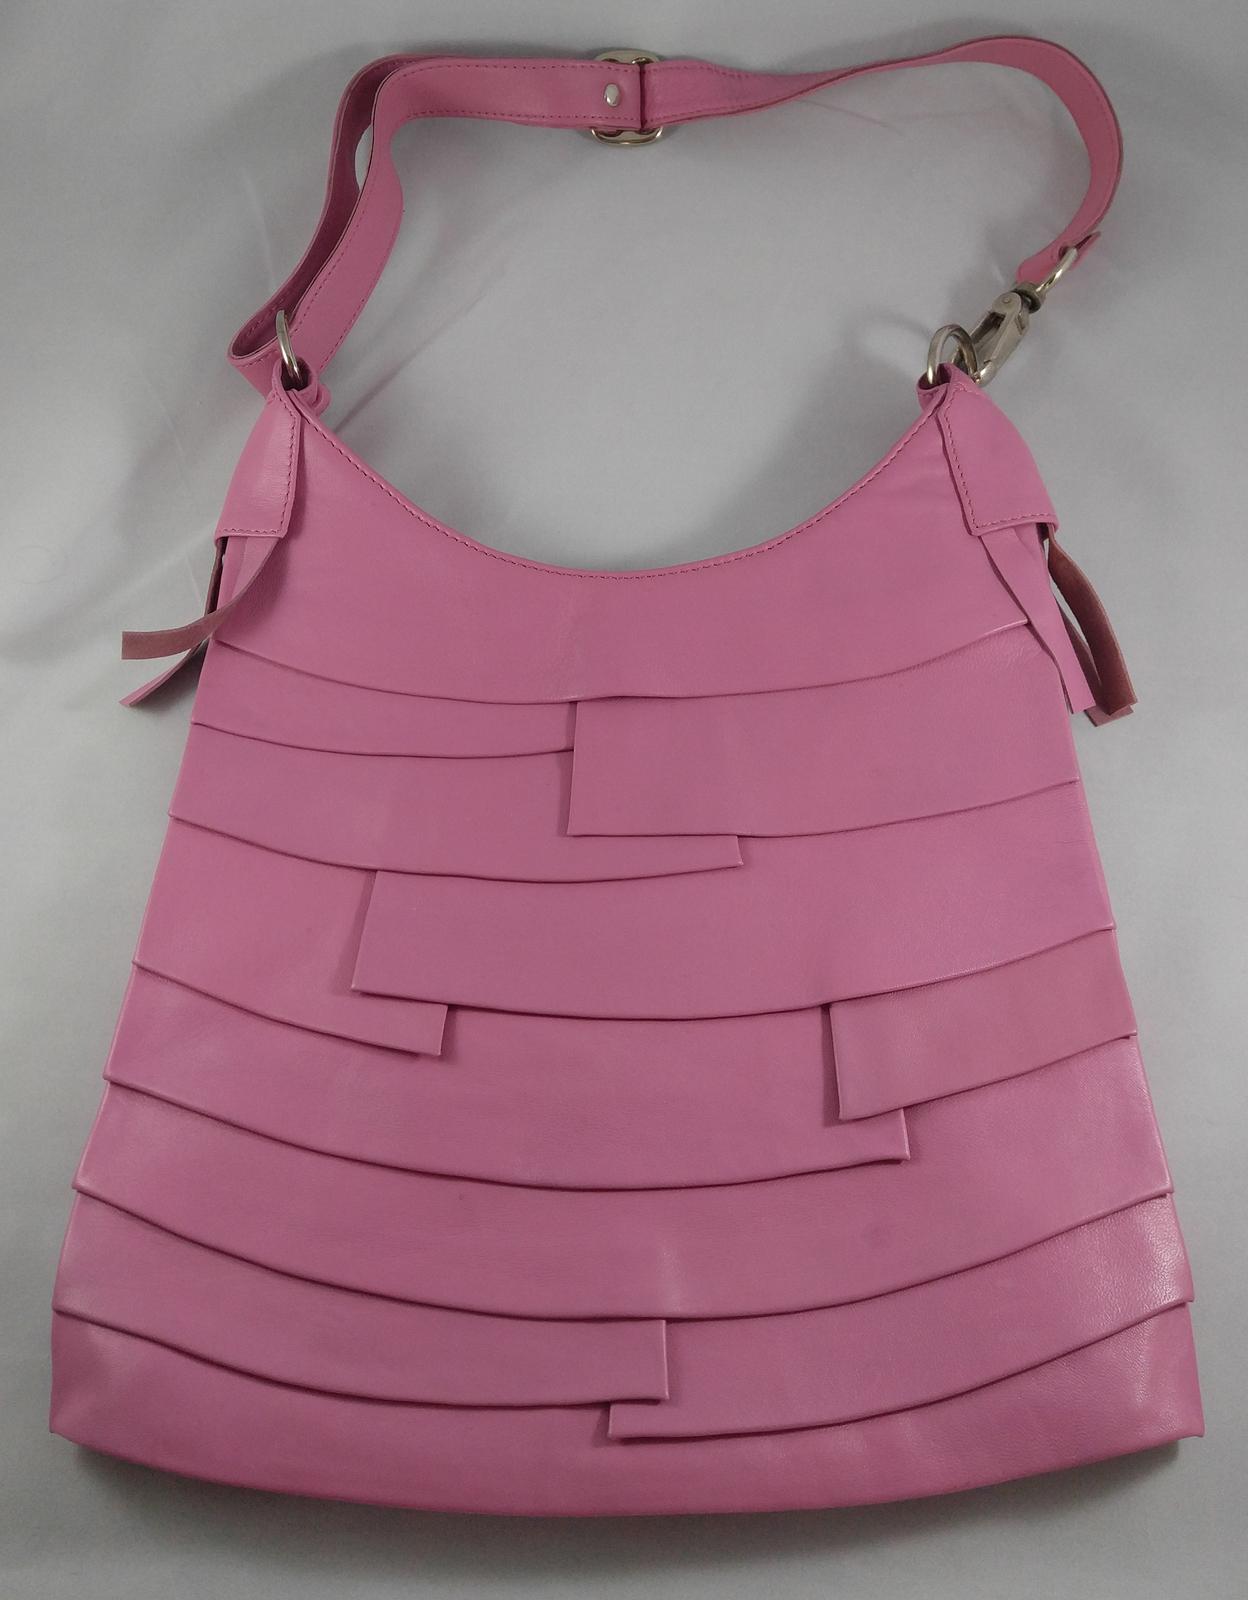 Kyss Handbags Designer Krista Orr Pink Shoulder Strap Purse Plymouth, Michigan